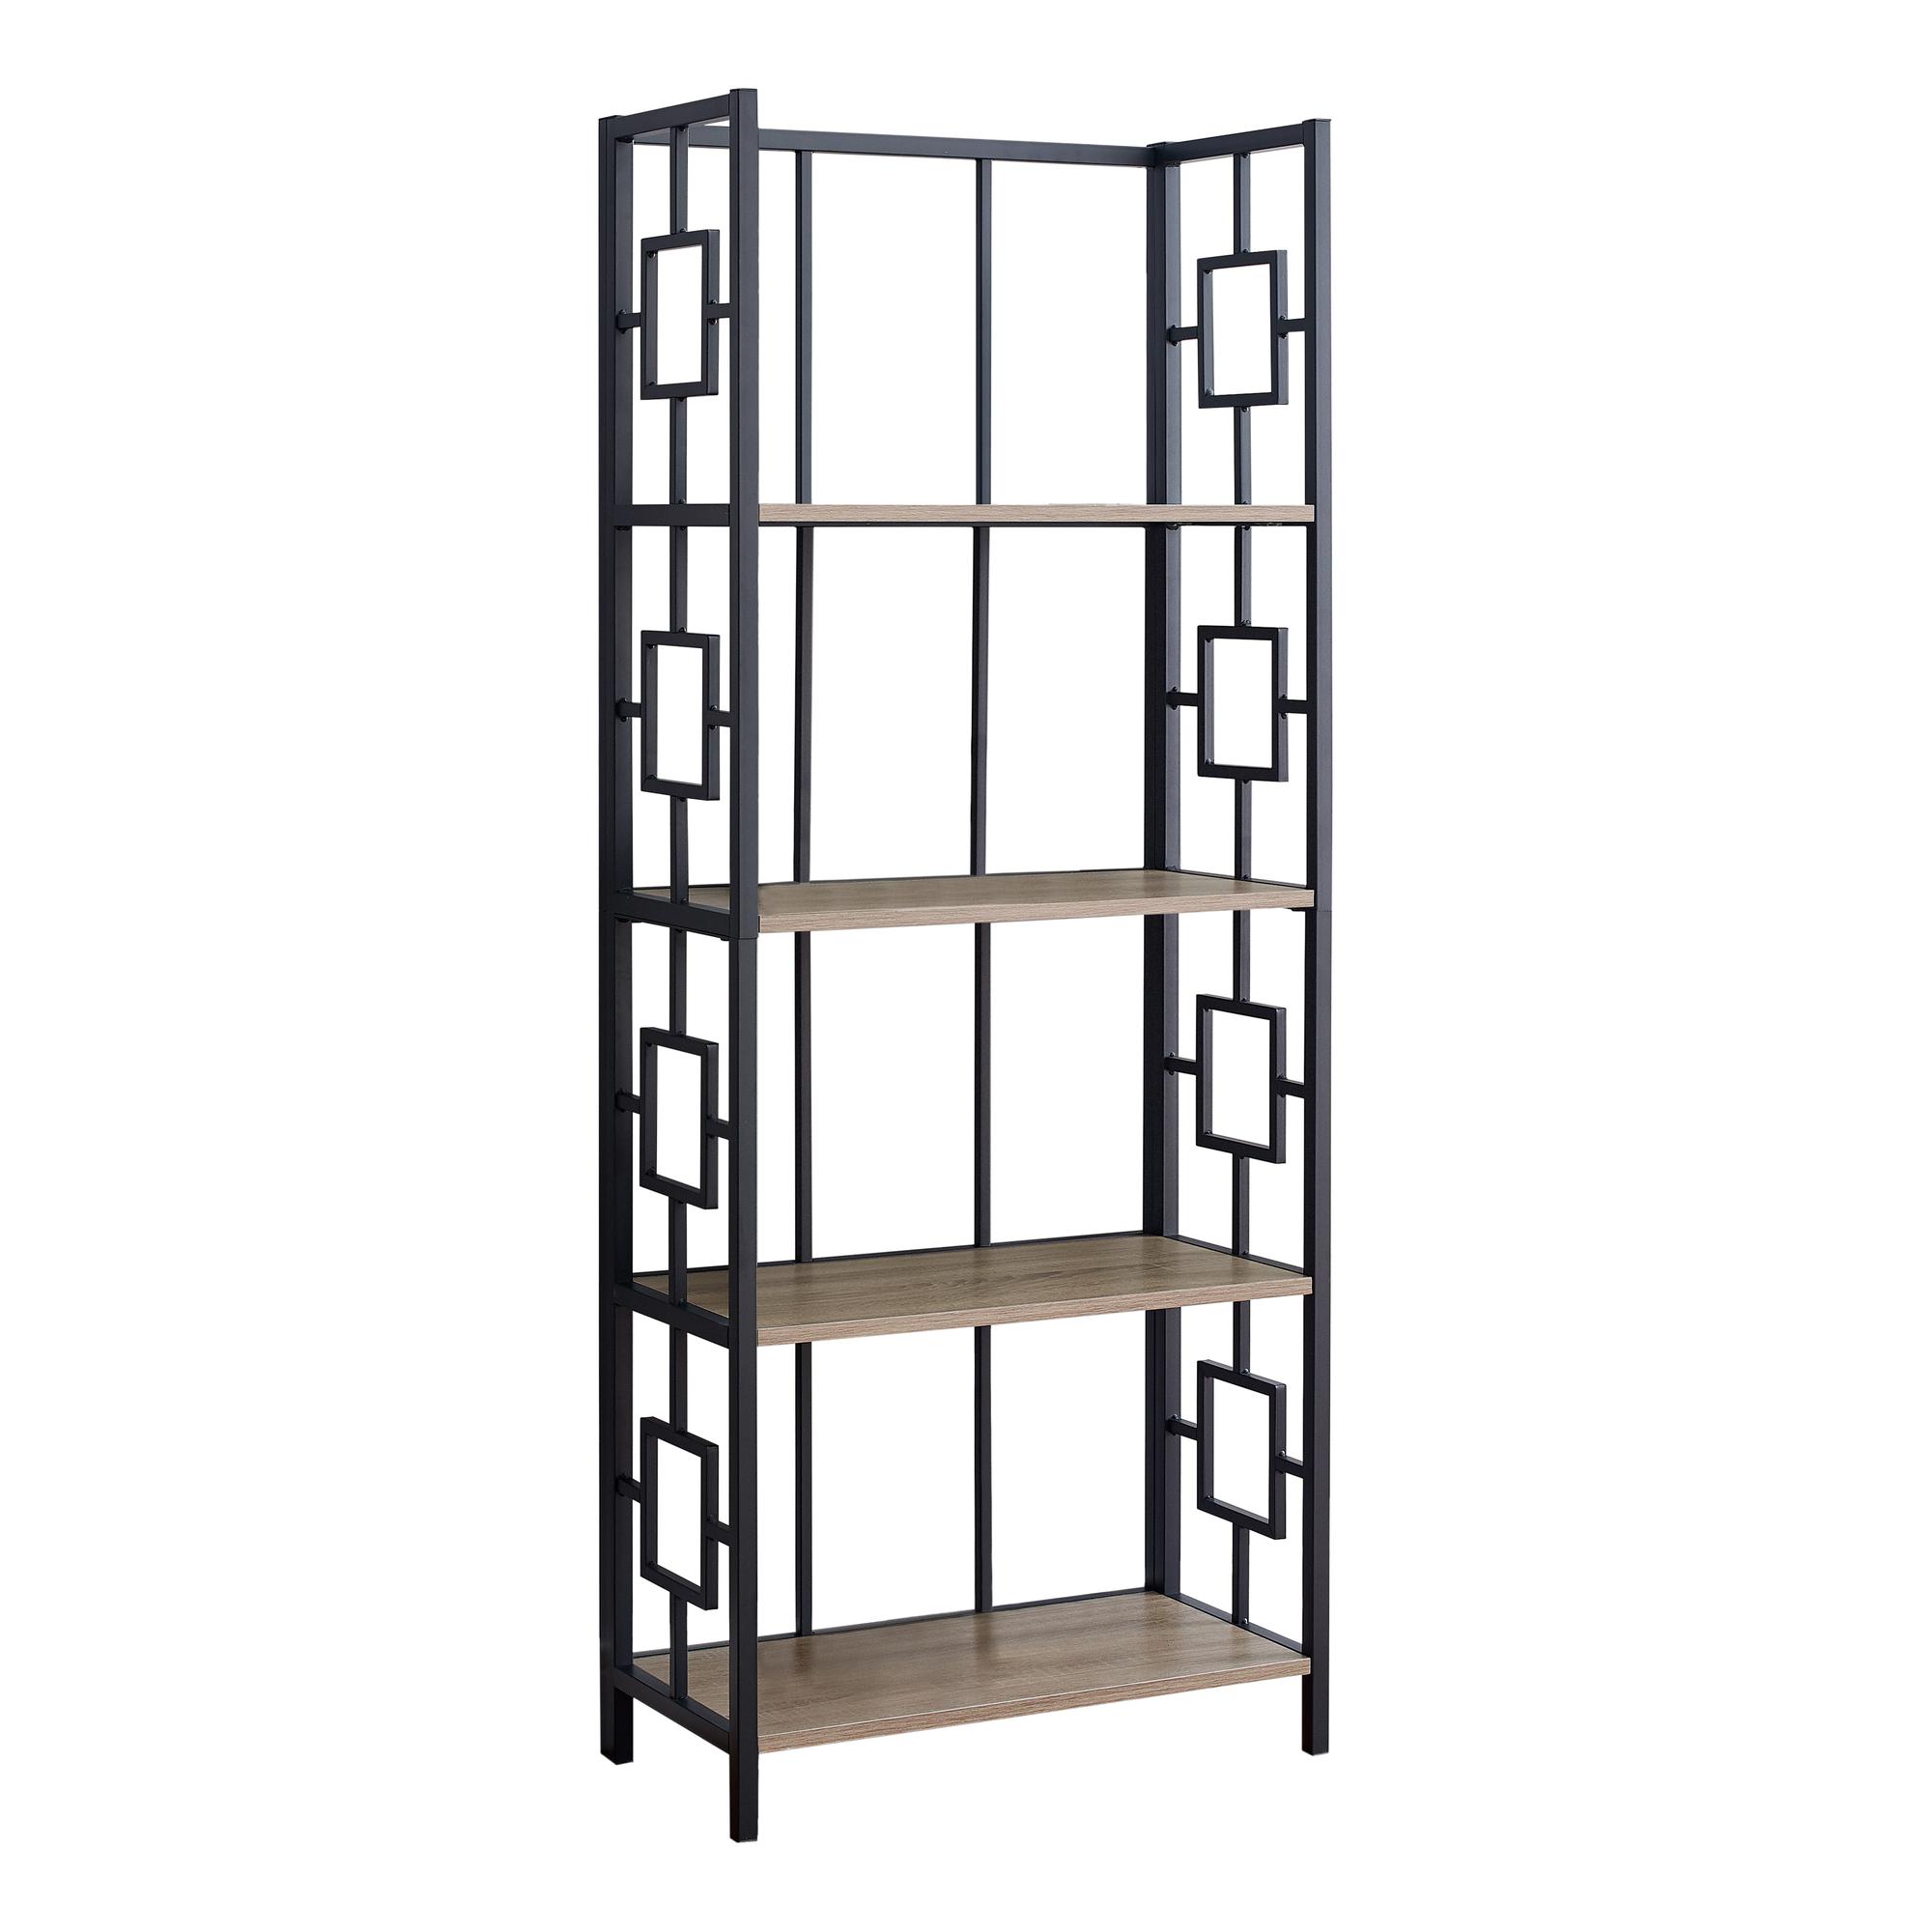 "62"" 4 Tier Bookcase Dark TaupewithBlack Metal Etagere"